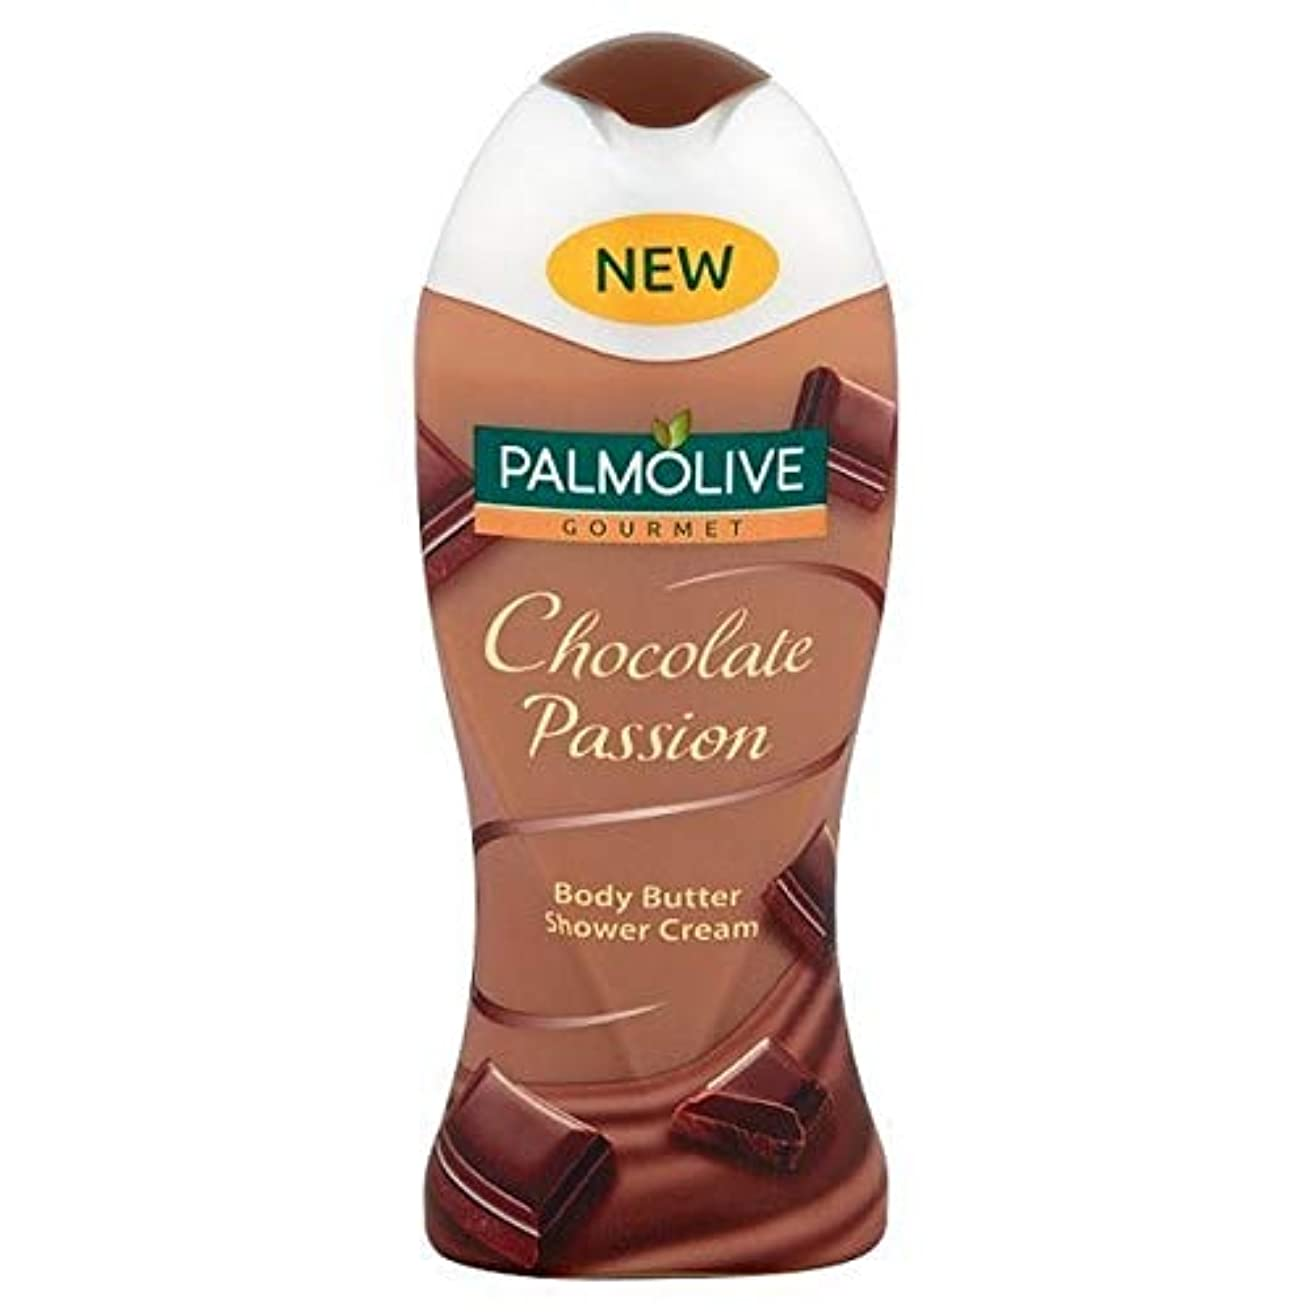 [Palmolive ] パルモグルメチョコレートパッションシャワージェル250ミリリットル - Palmolive Gourmet Chocolate Passion Shower Gel 250ml [並行輸入品]